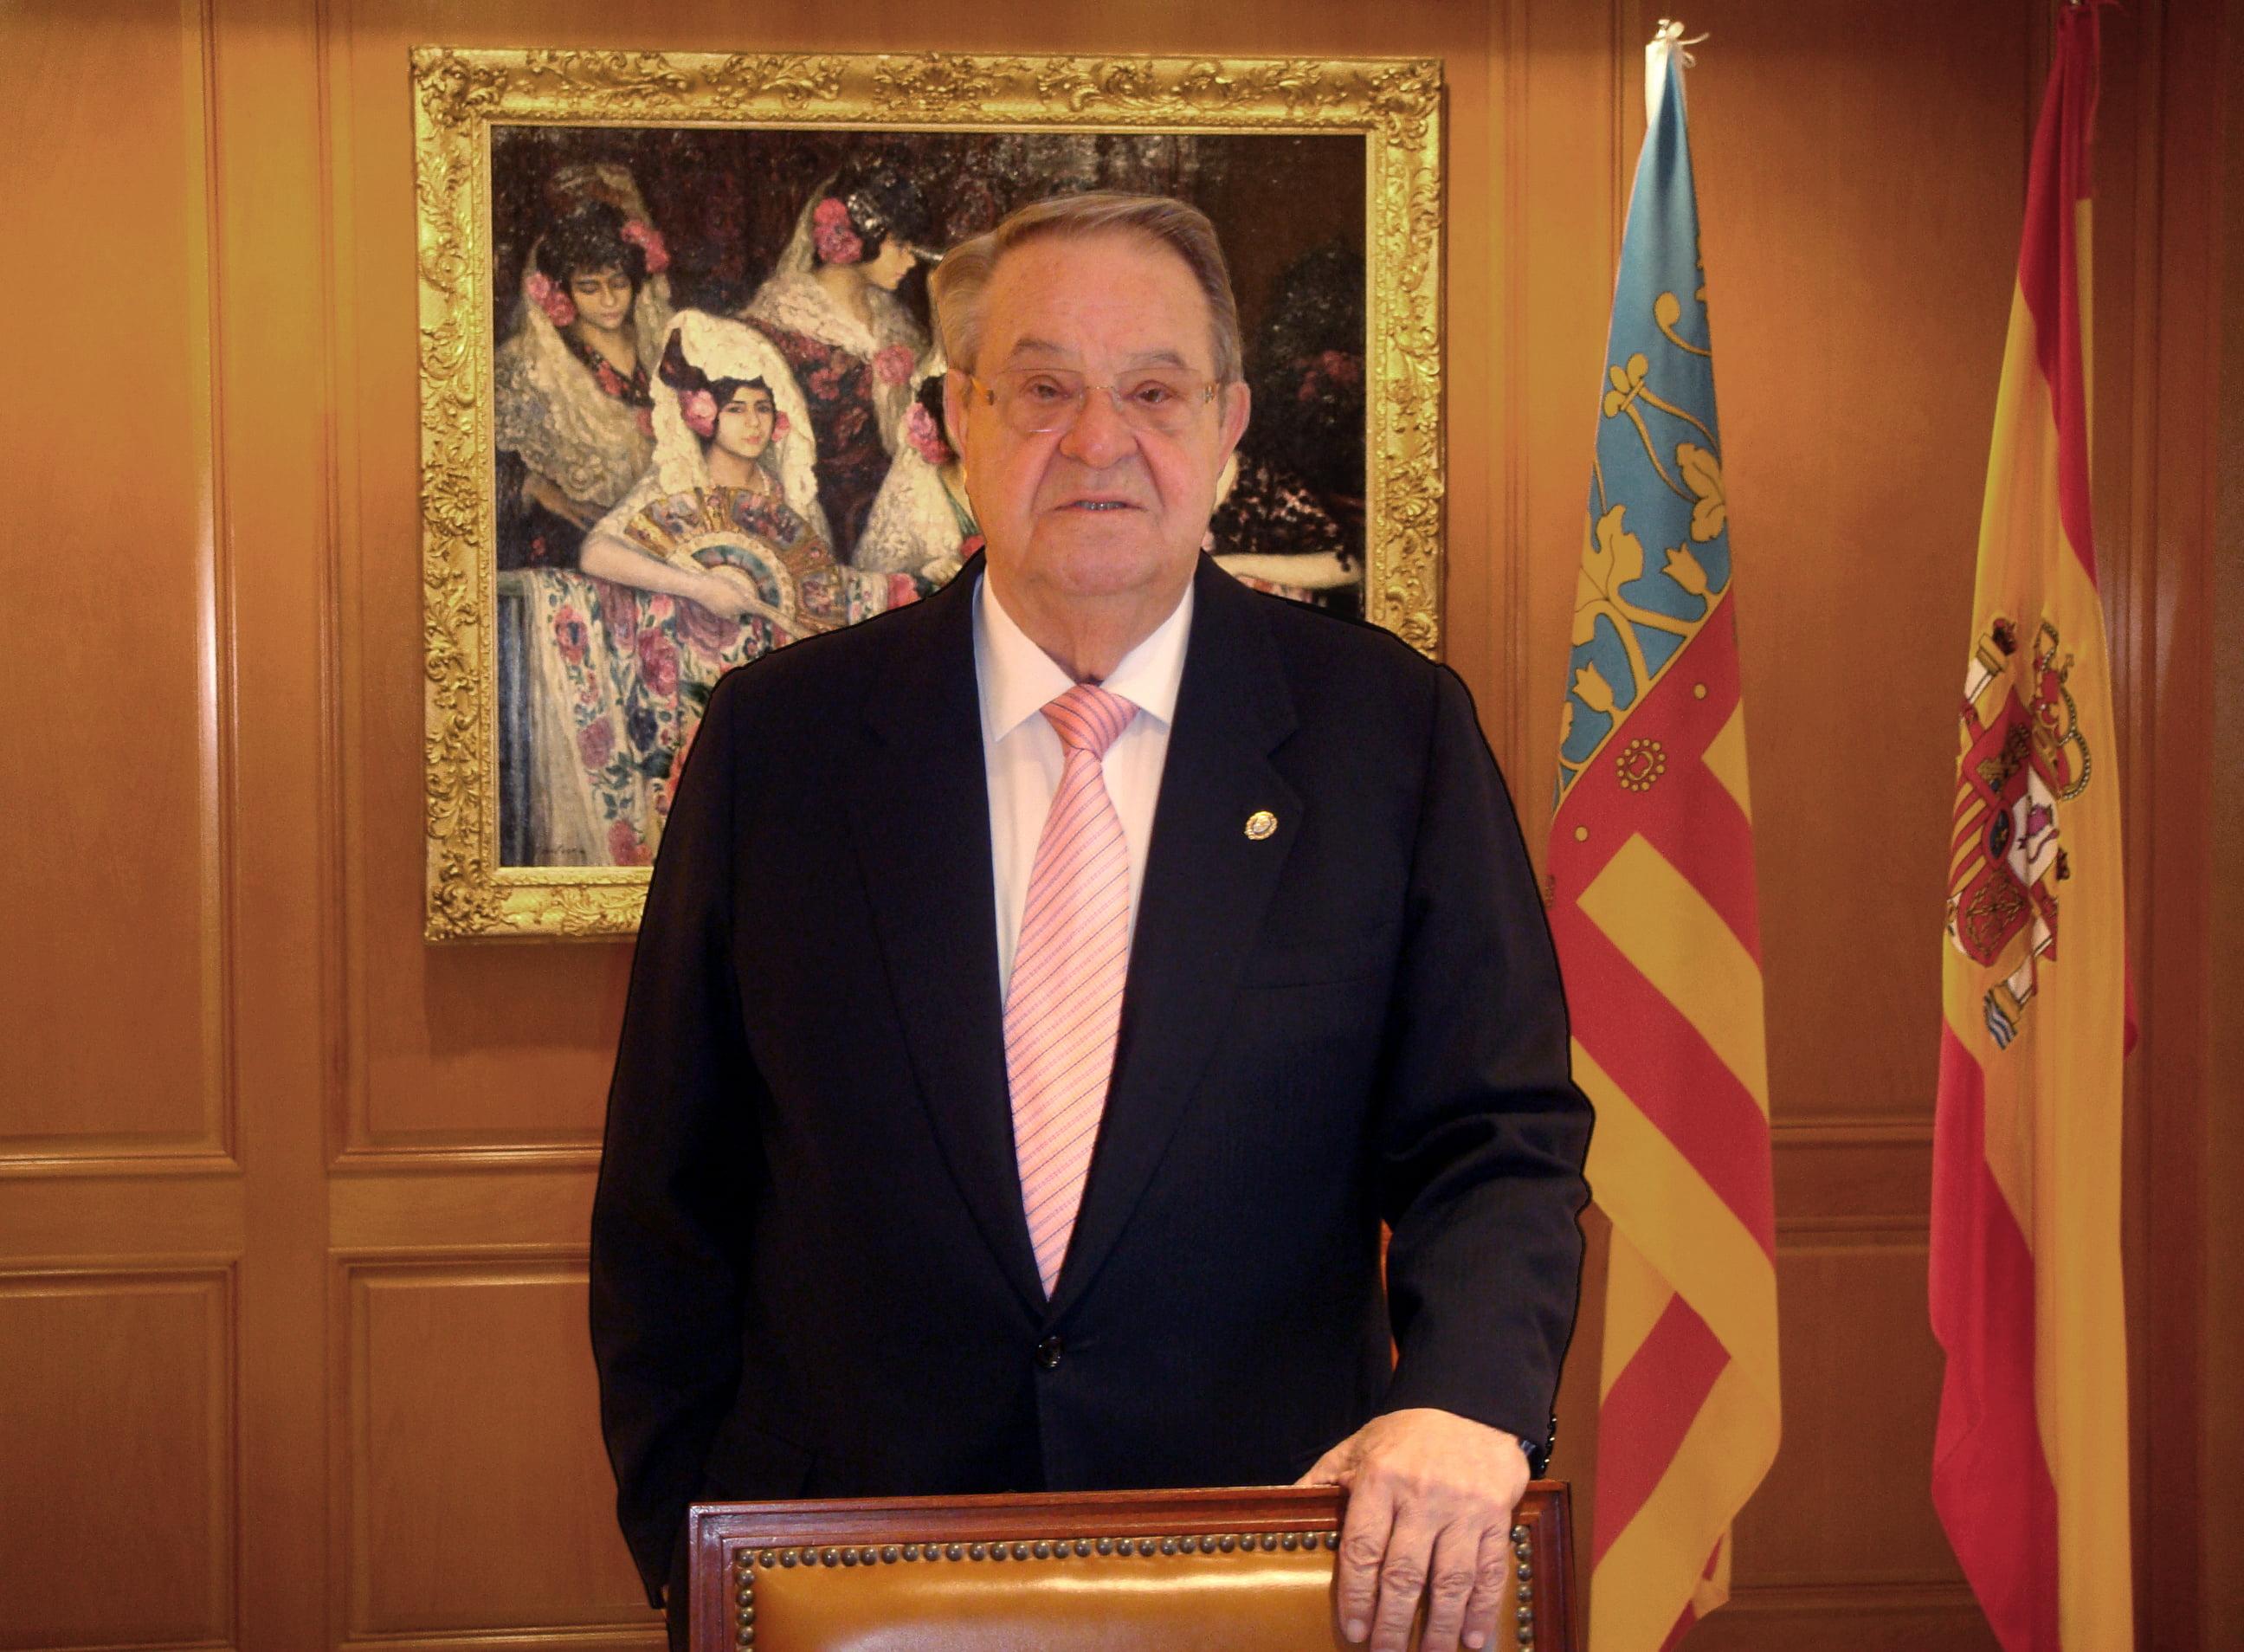 Sr. Rafael Benavent Adrián